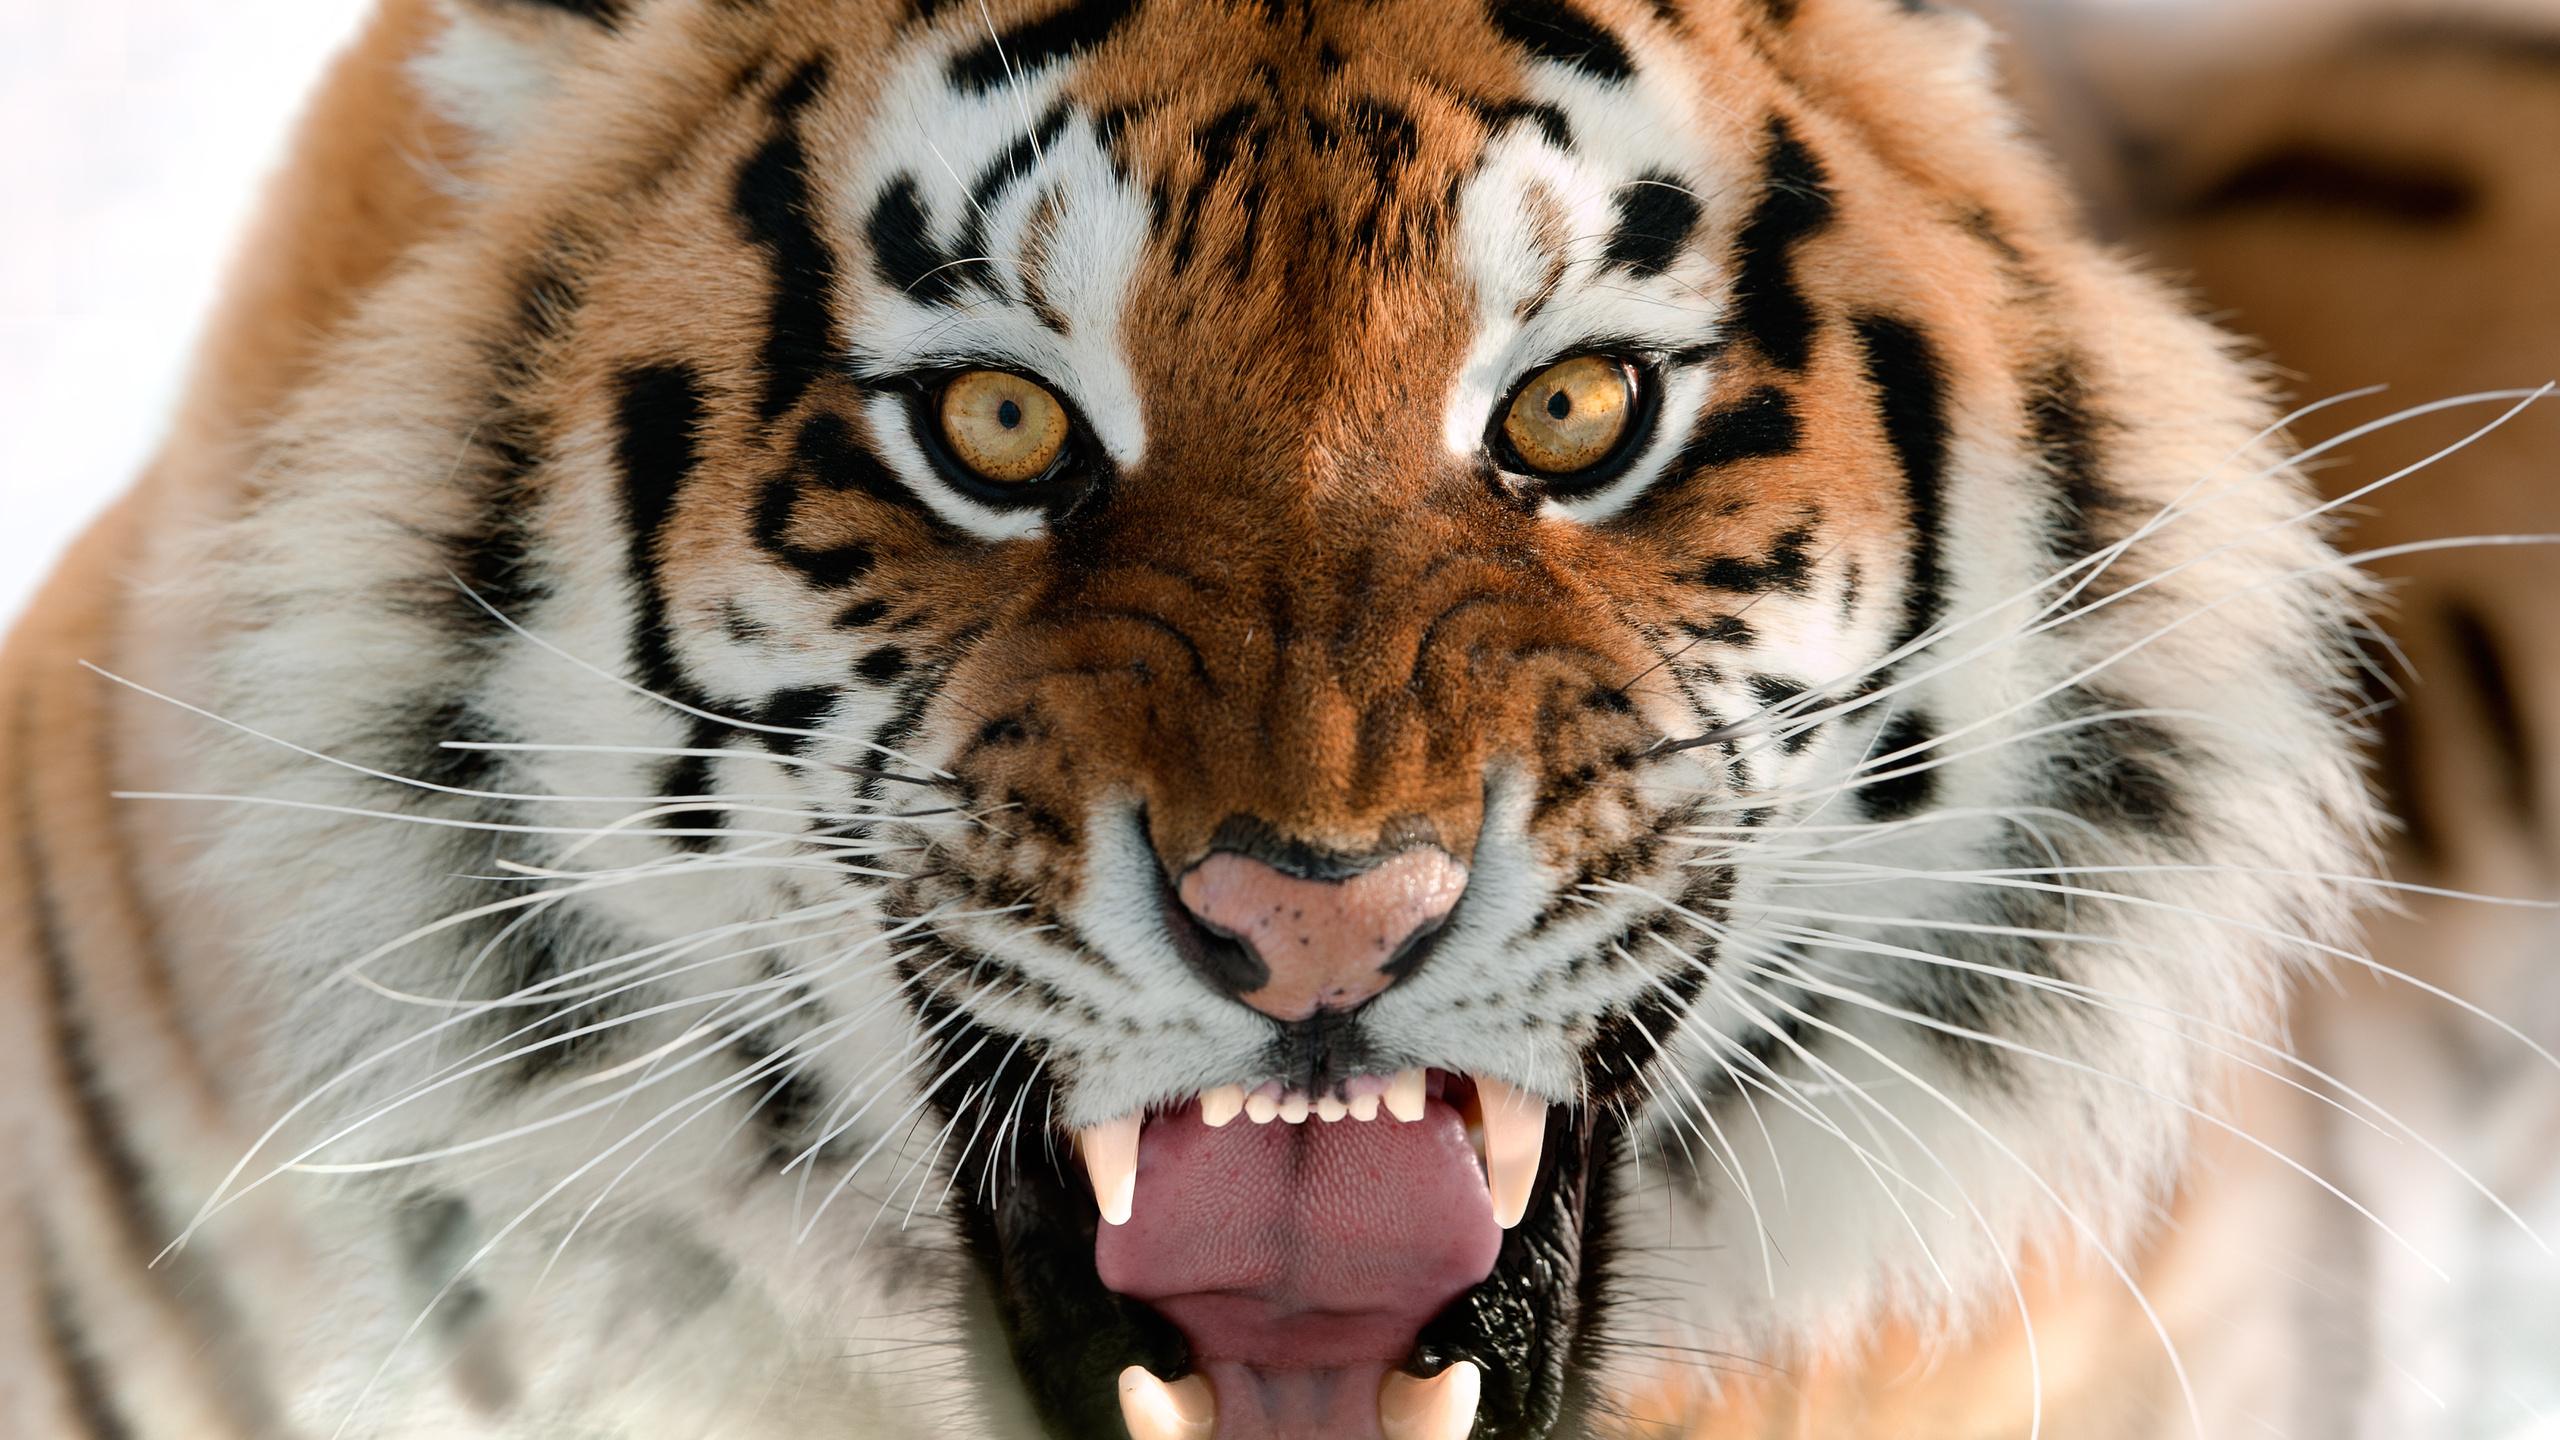 Надписями, тигры фото картинки оскал